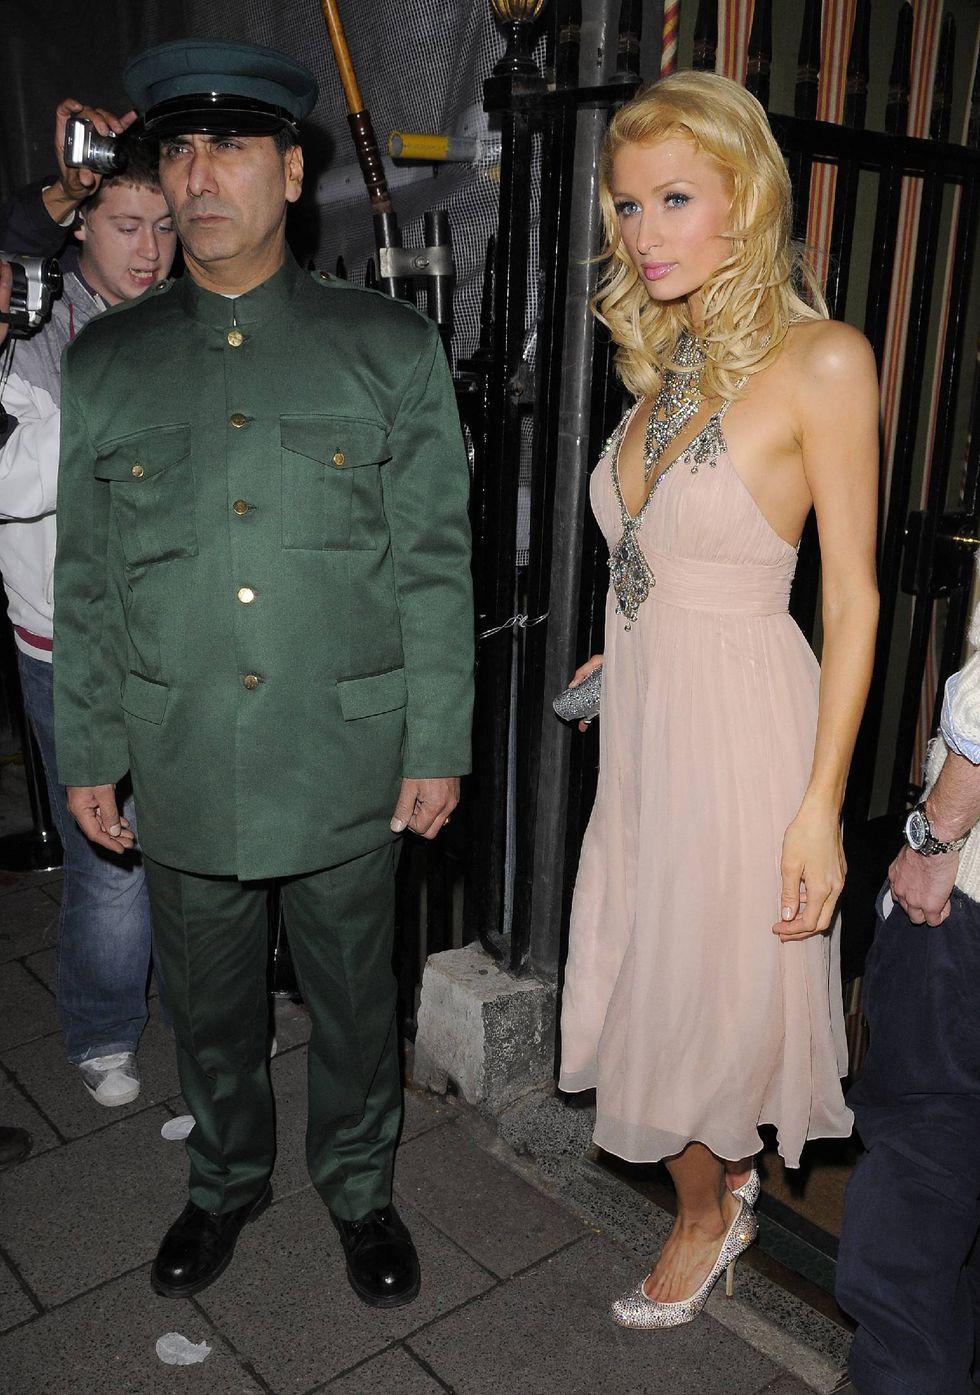 paris-hilton-at-annabels-private-members-club-in-london-06